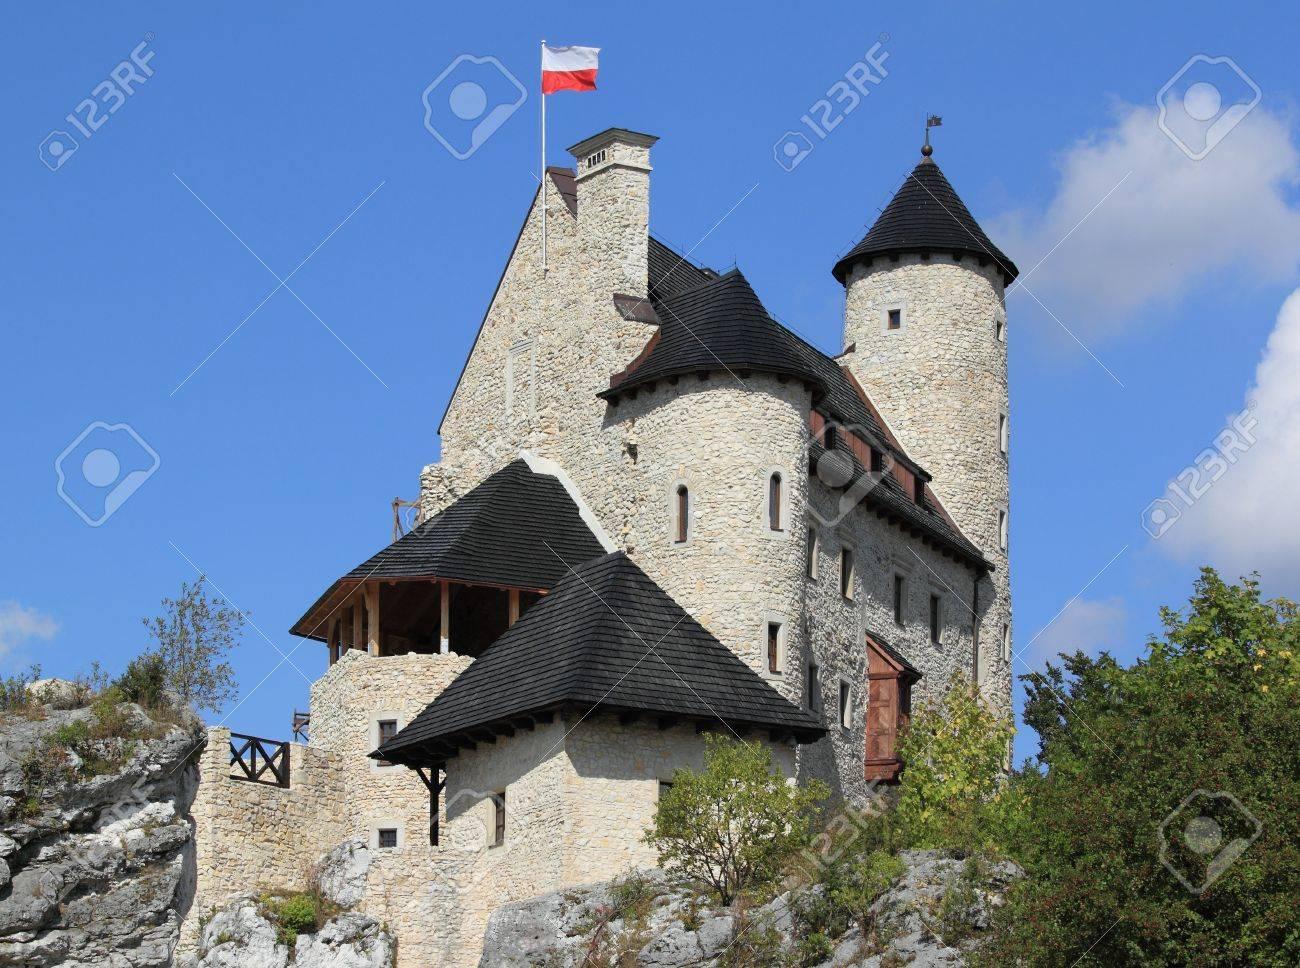 Bobolice castle - old fortress in Poland. Landmark in Europe. Stock Photo - 12943826